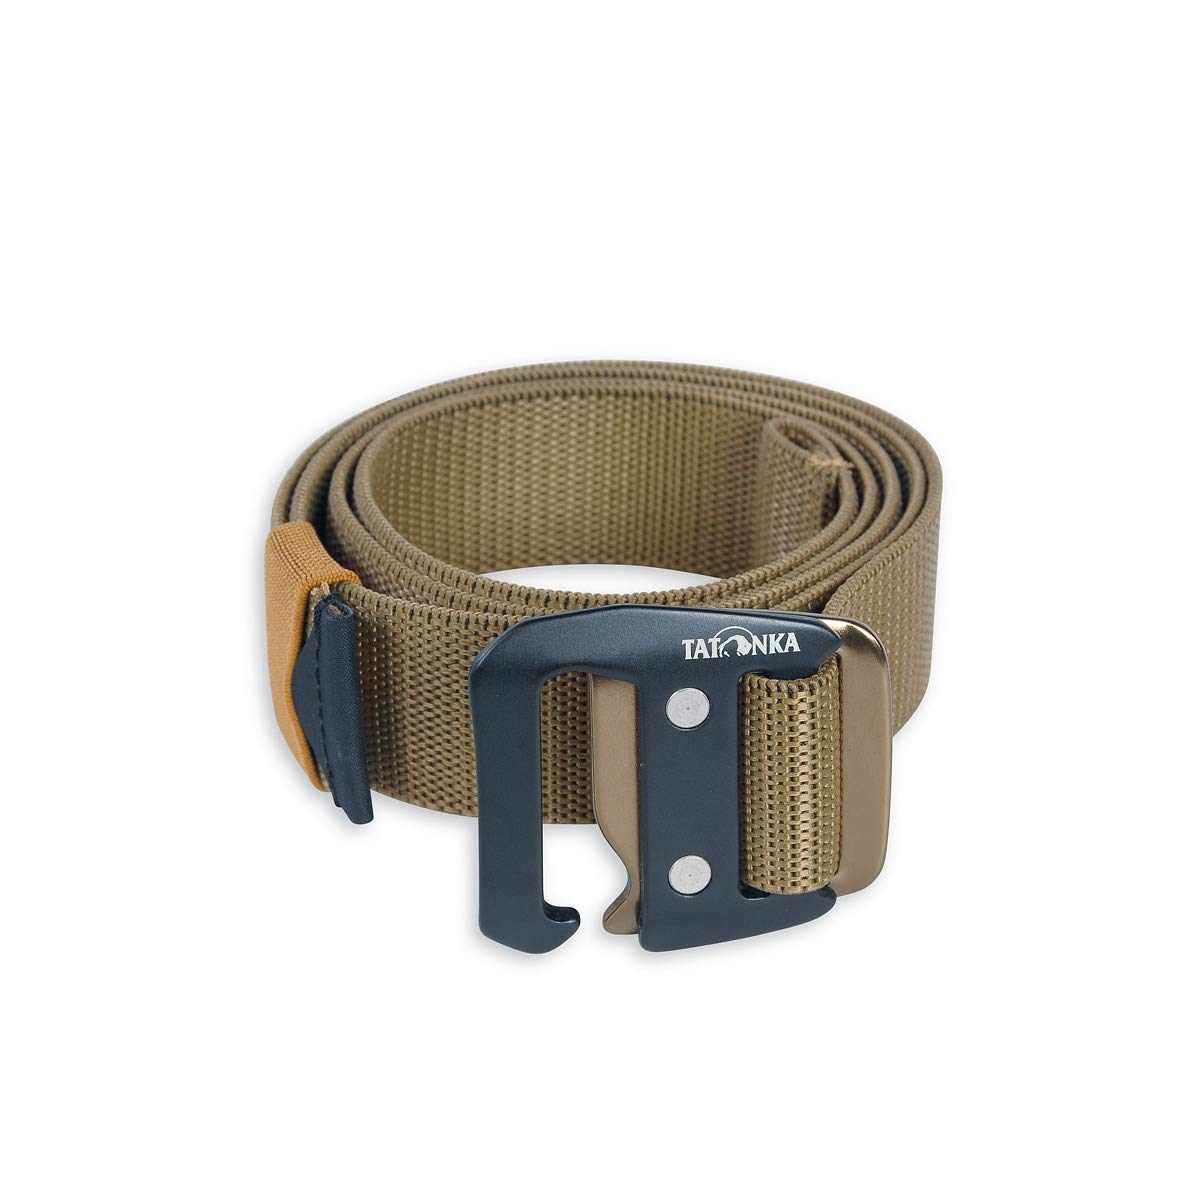 Tatonka Herren Gürtel Stretch Belt 32 mm, Coyote Brown, 125 x 3,2 cm